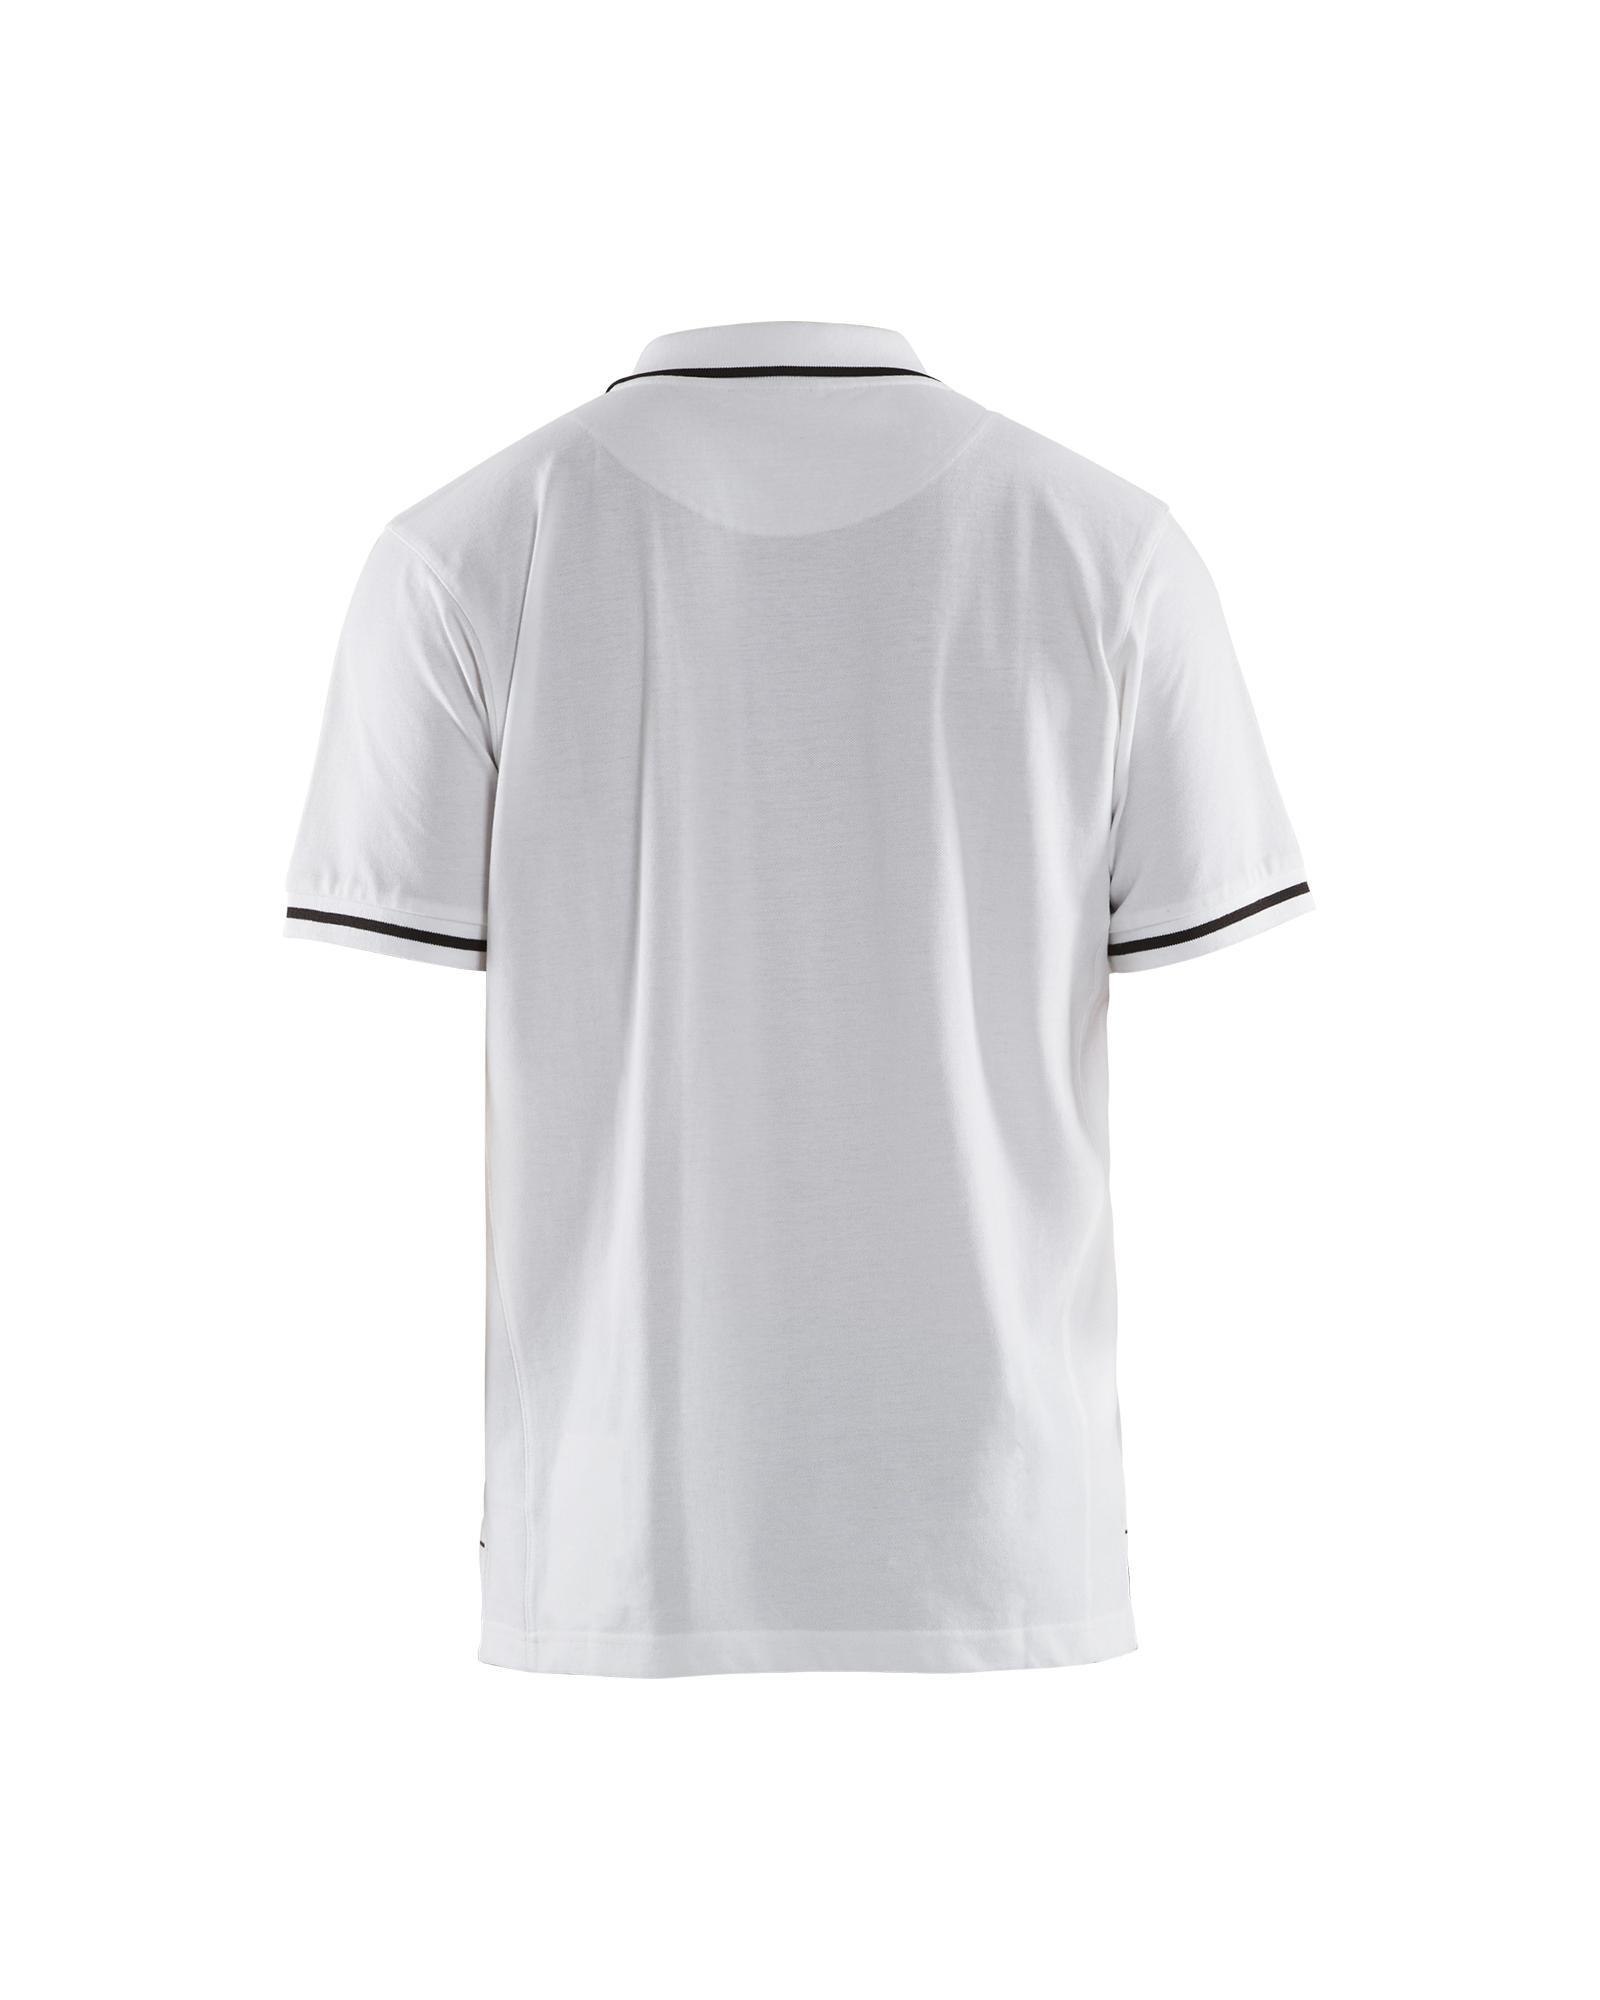 X-Large Grey//Cornflower Blue Blaklader 338910509485XL Polo Shirt